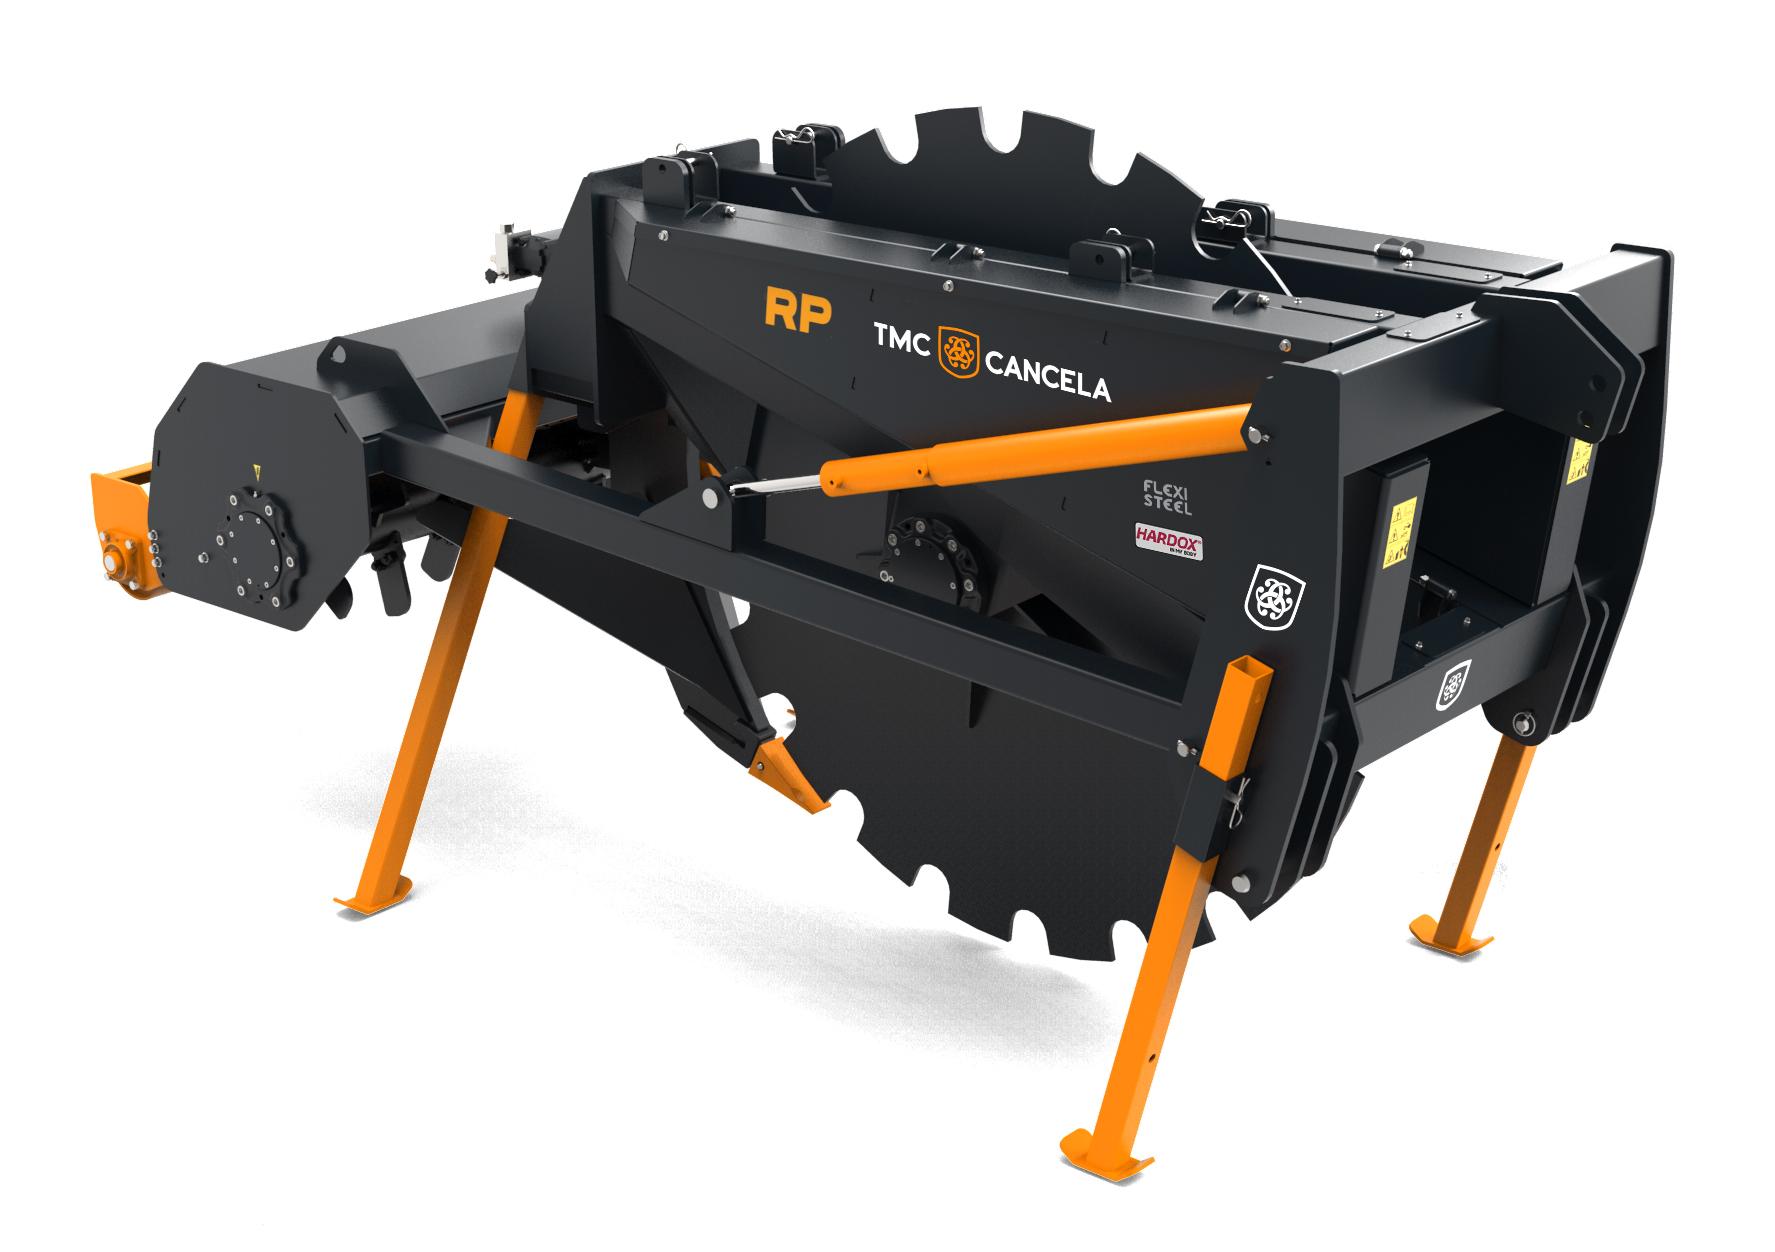 RP 02 Trinciatrice Trincia Trituradora Triturador Forestal Foresta Forestale